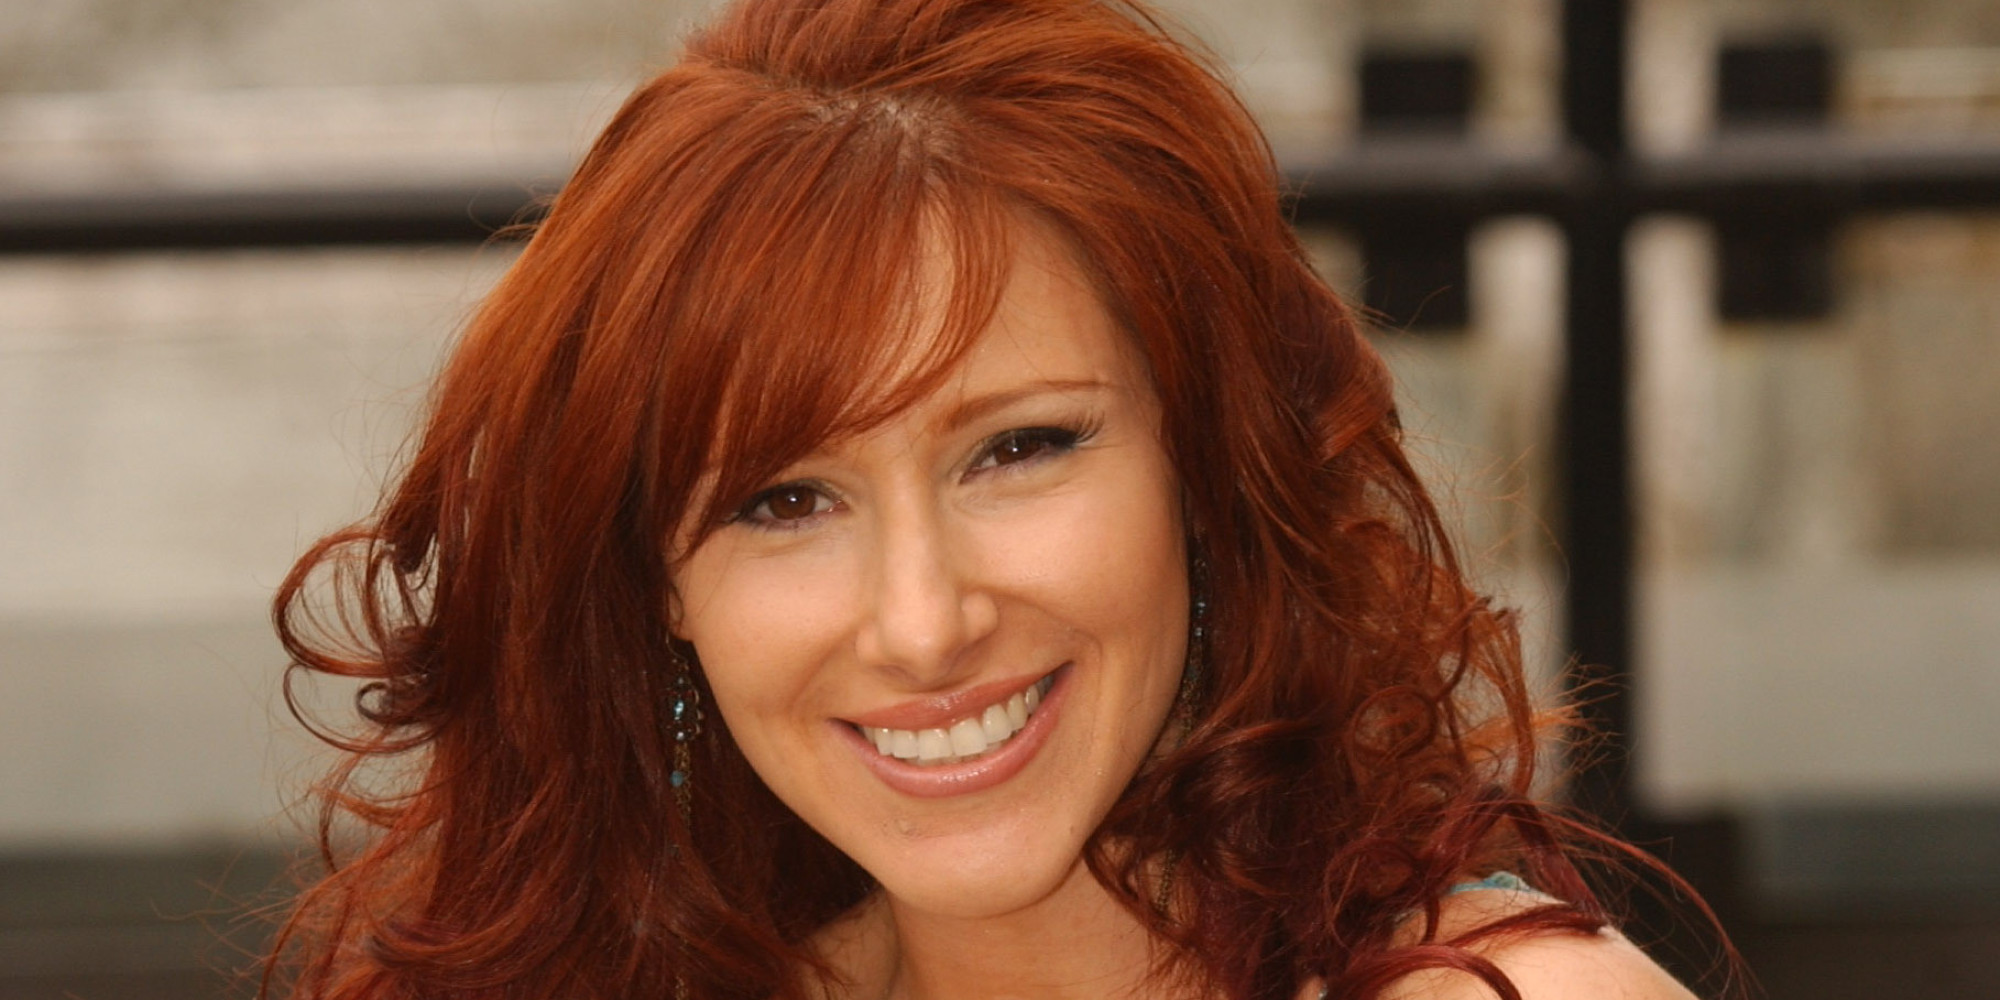 The Pop Star Tiffany Singer